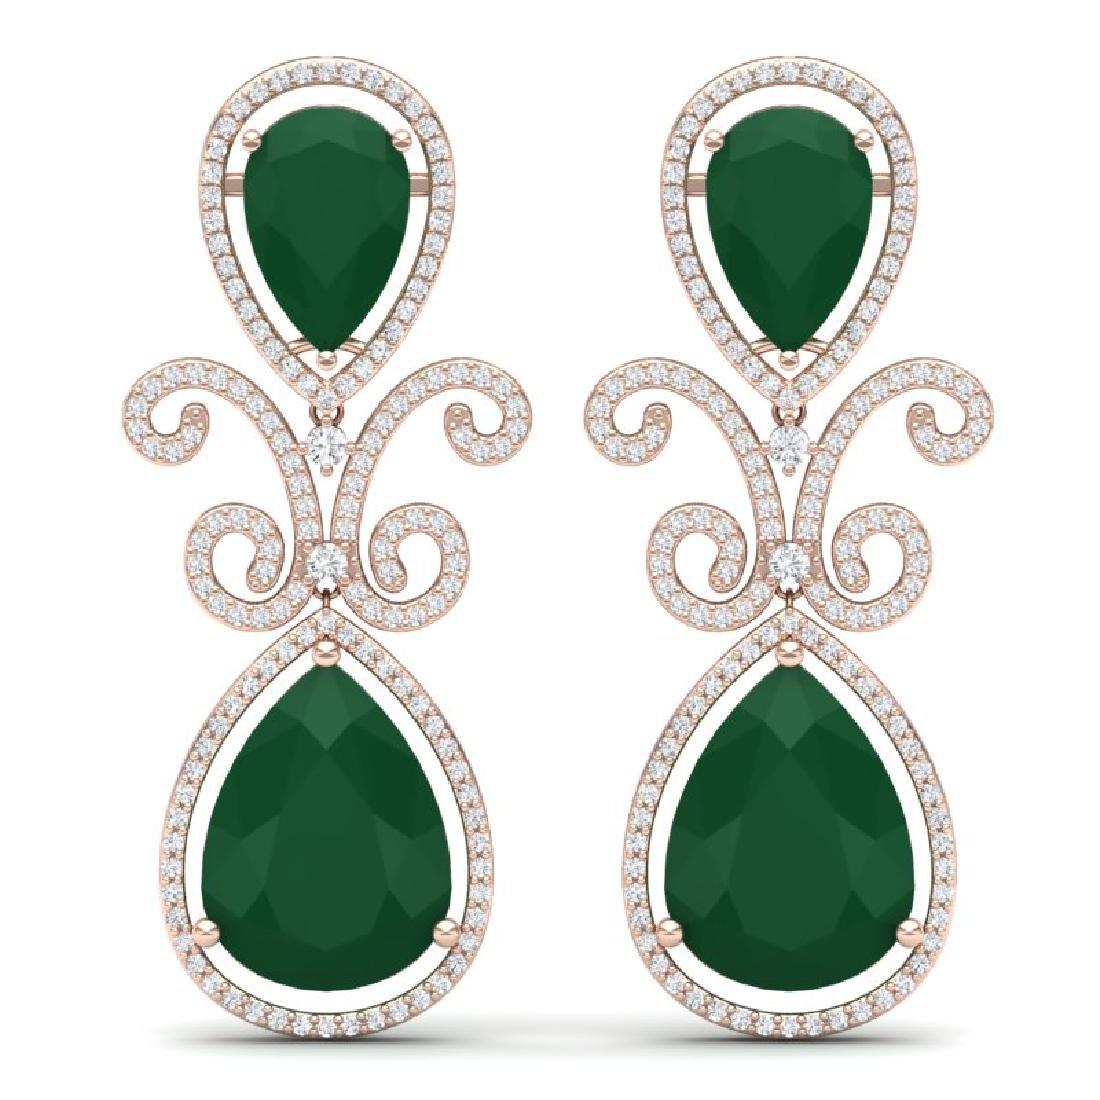 31.6 CTW Royalty Emerald & VS Diamond Earrings 18K Rose